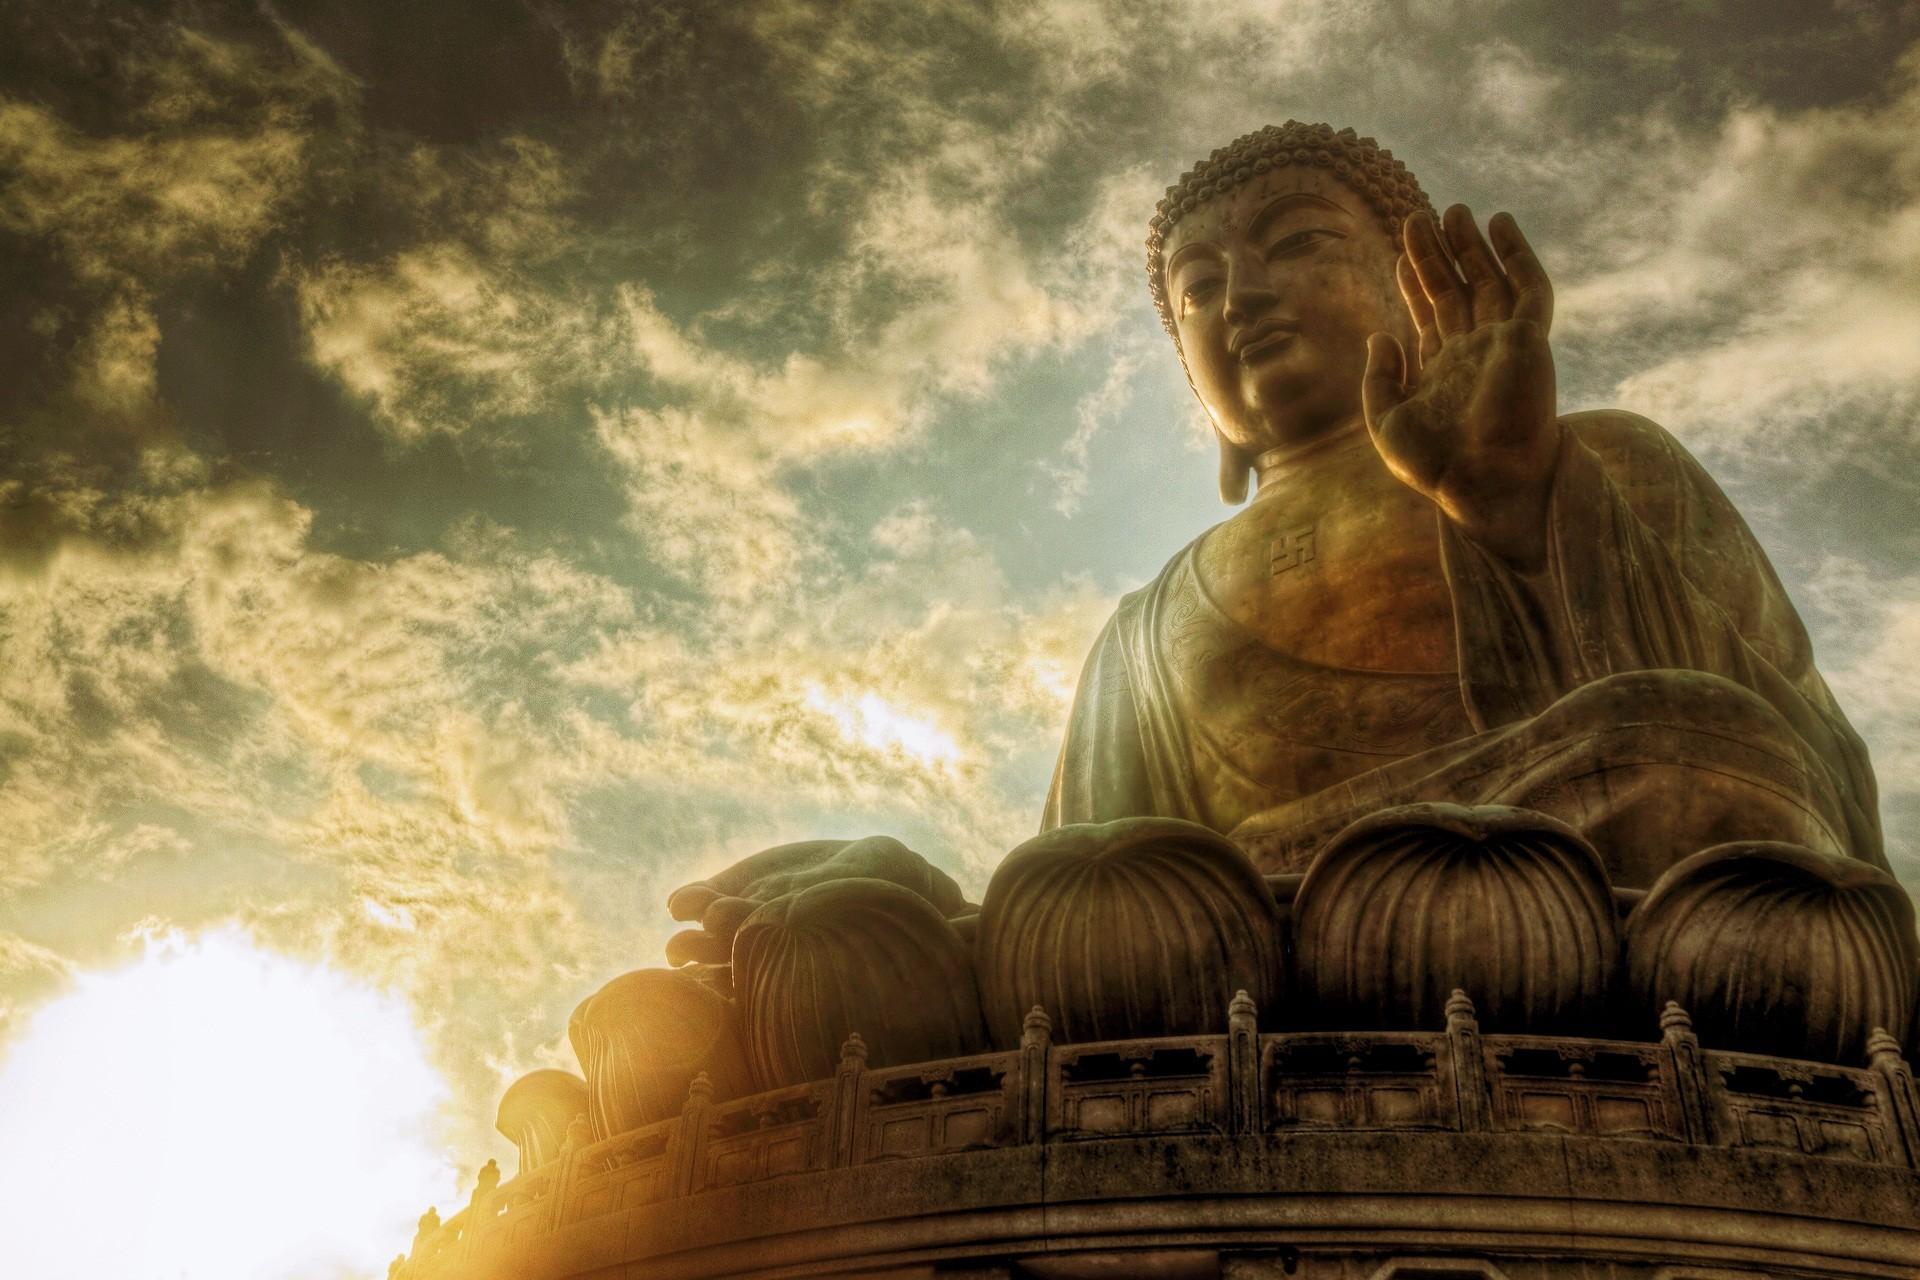 Beautiful Buddha HD Wallpaper, Tian Tan Buddha, Lantau Island